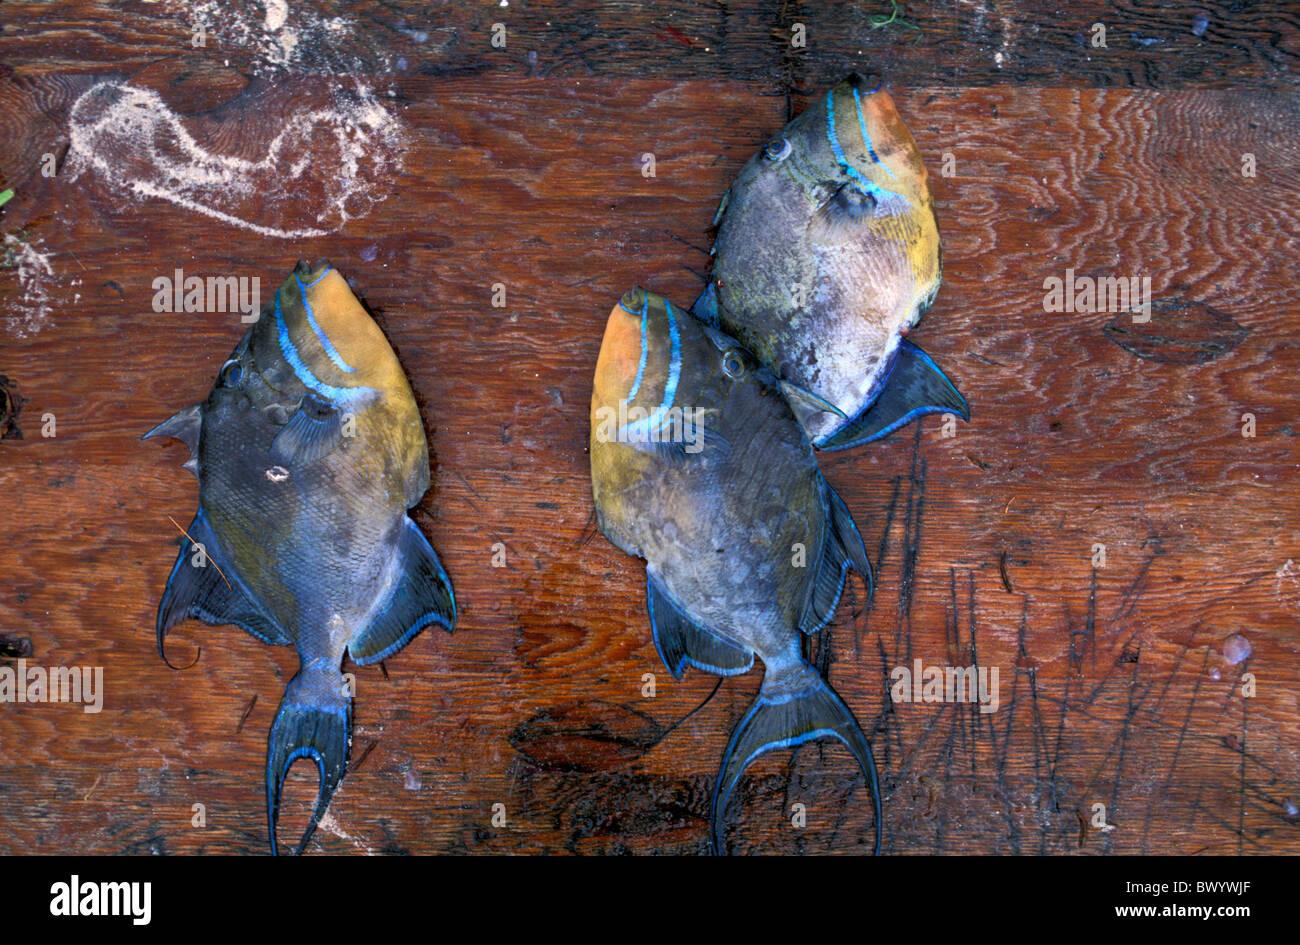 animal animals Cat Island Bahamas dead Fish market - Stock Image